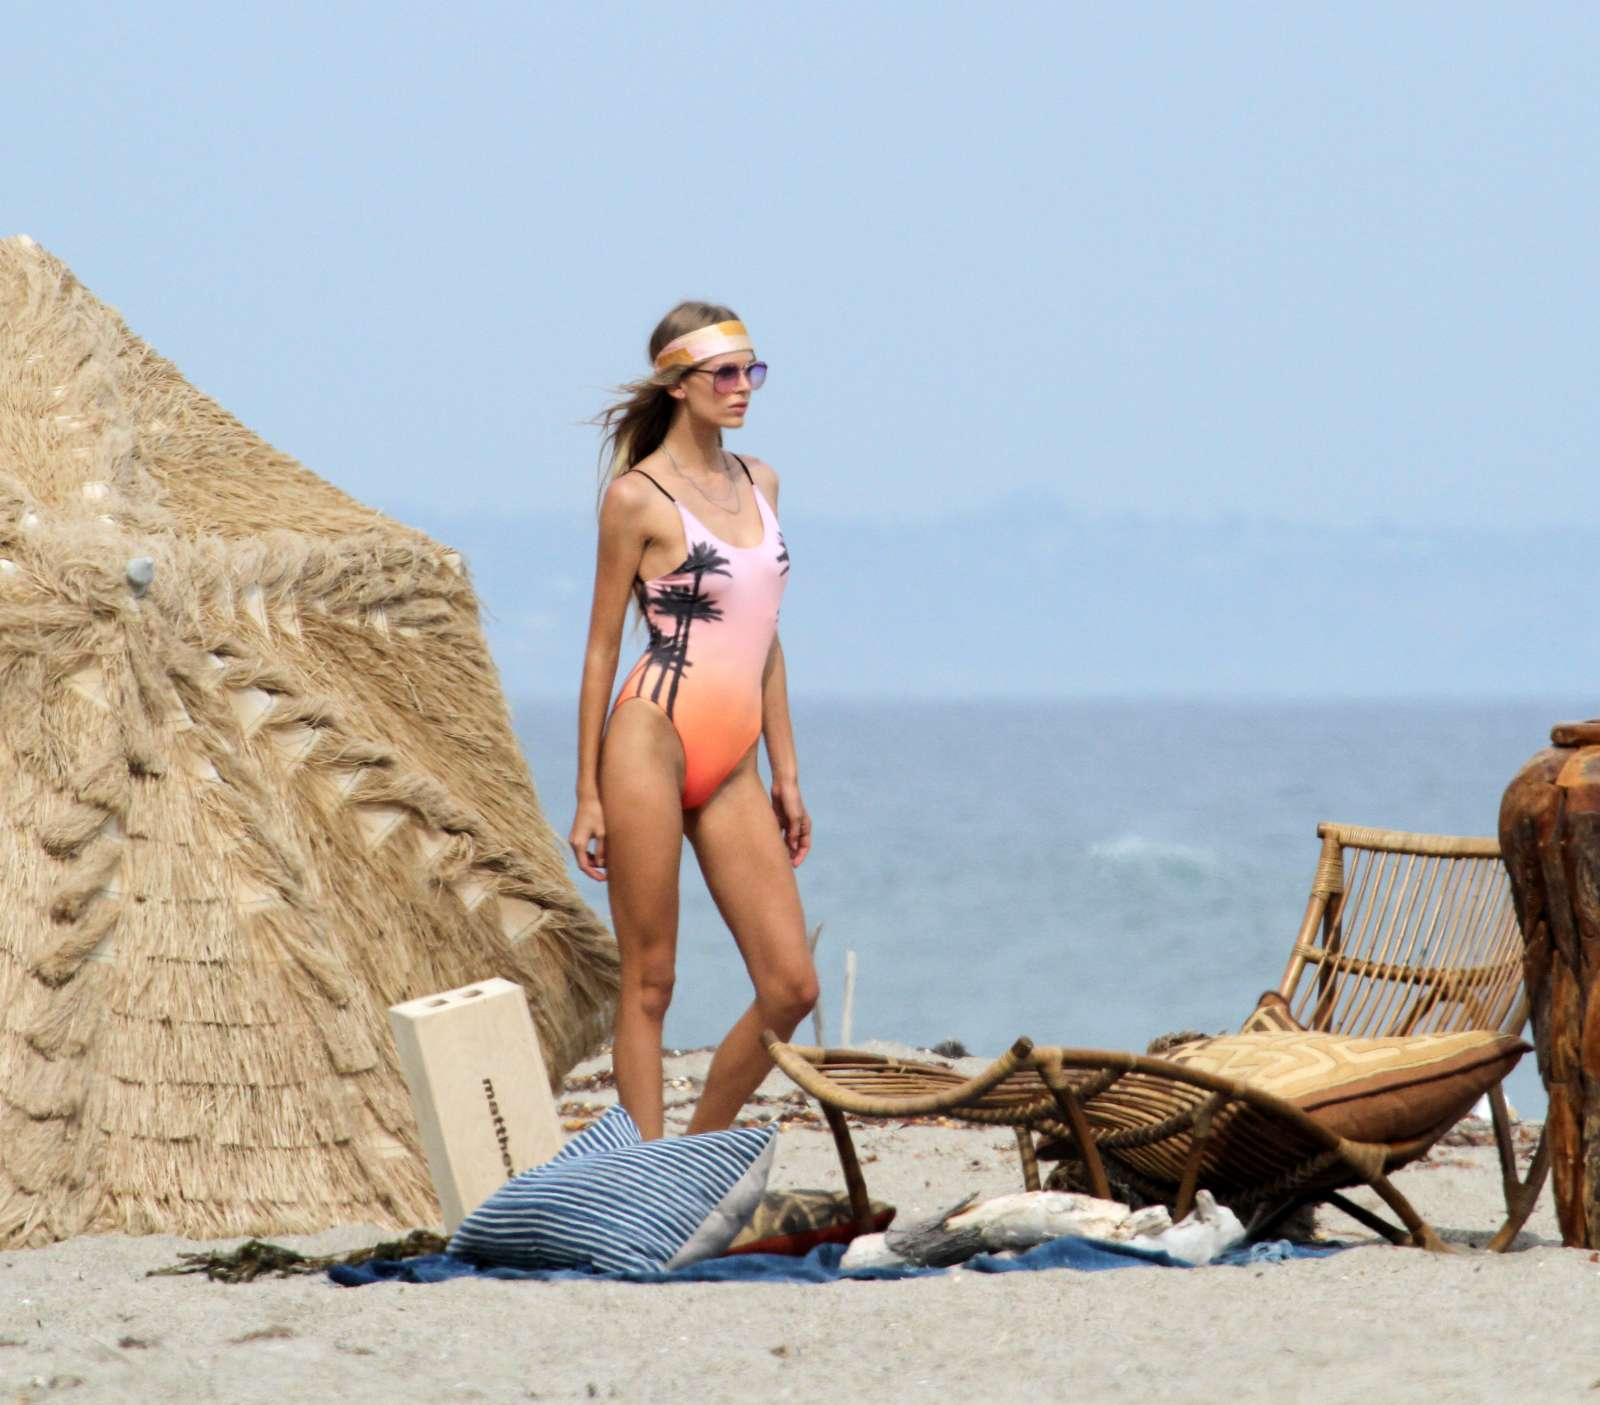 Elsa hosk posing in a bikini malibu